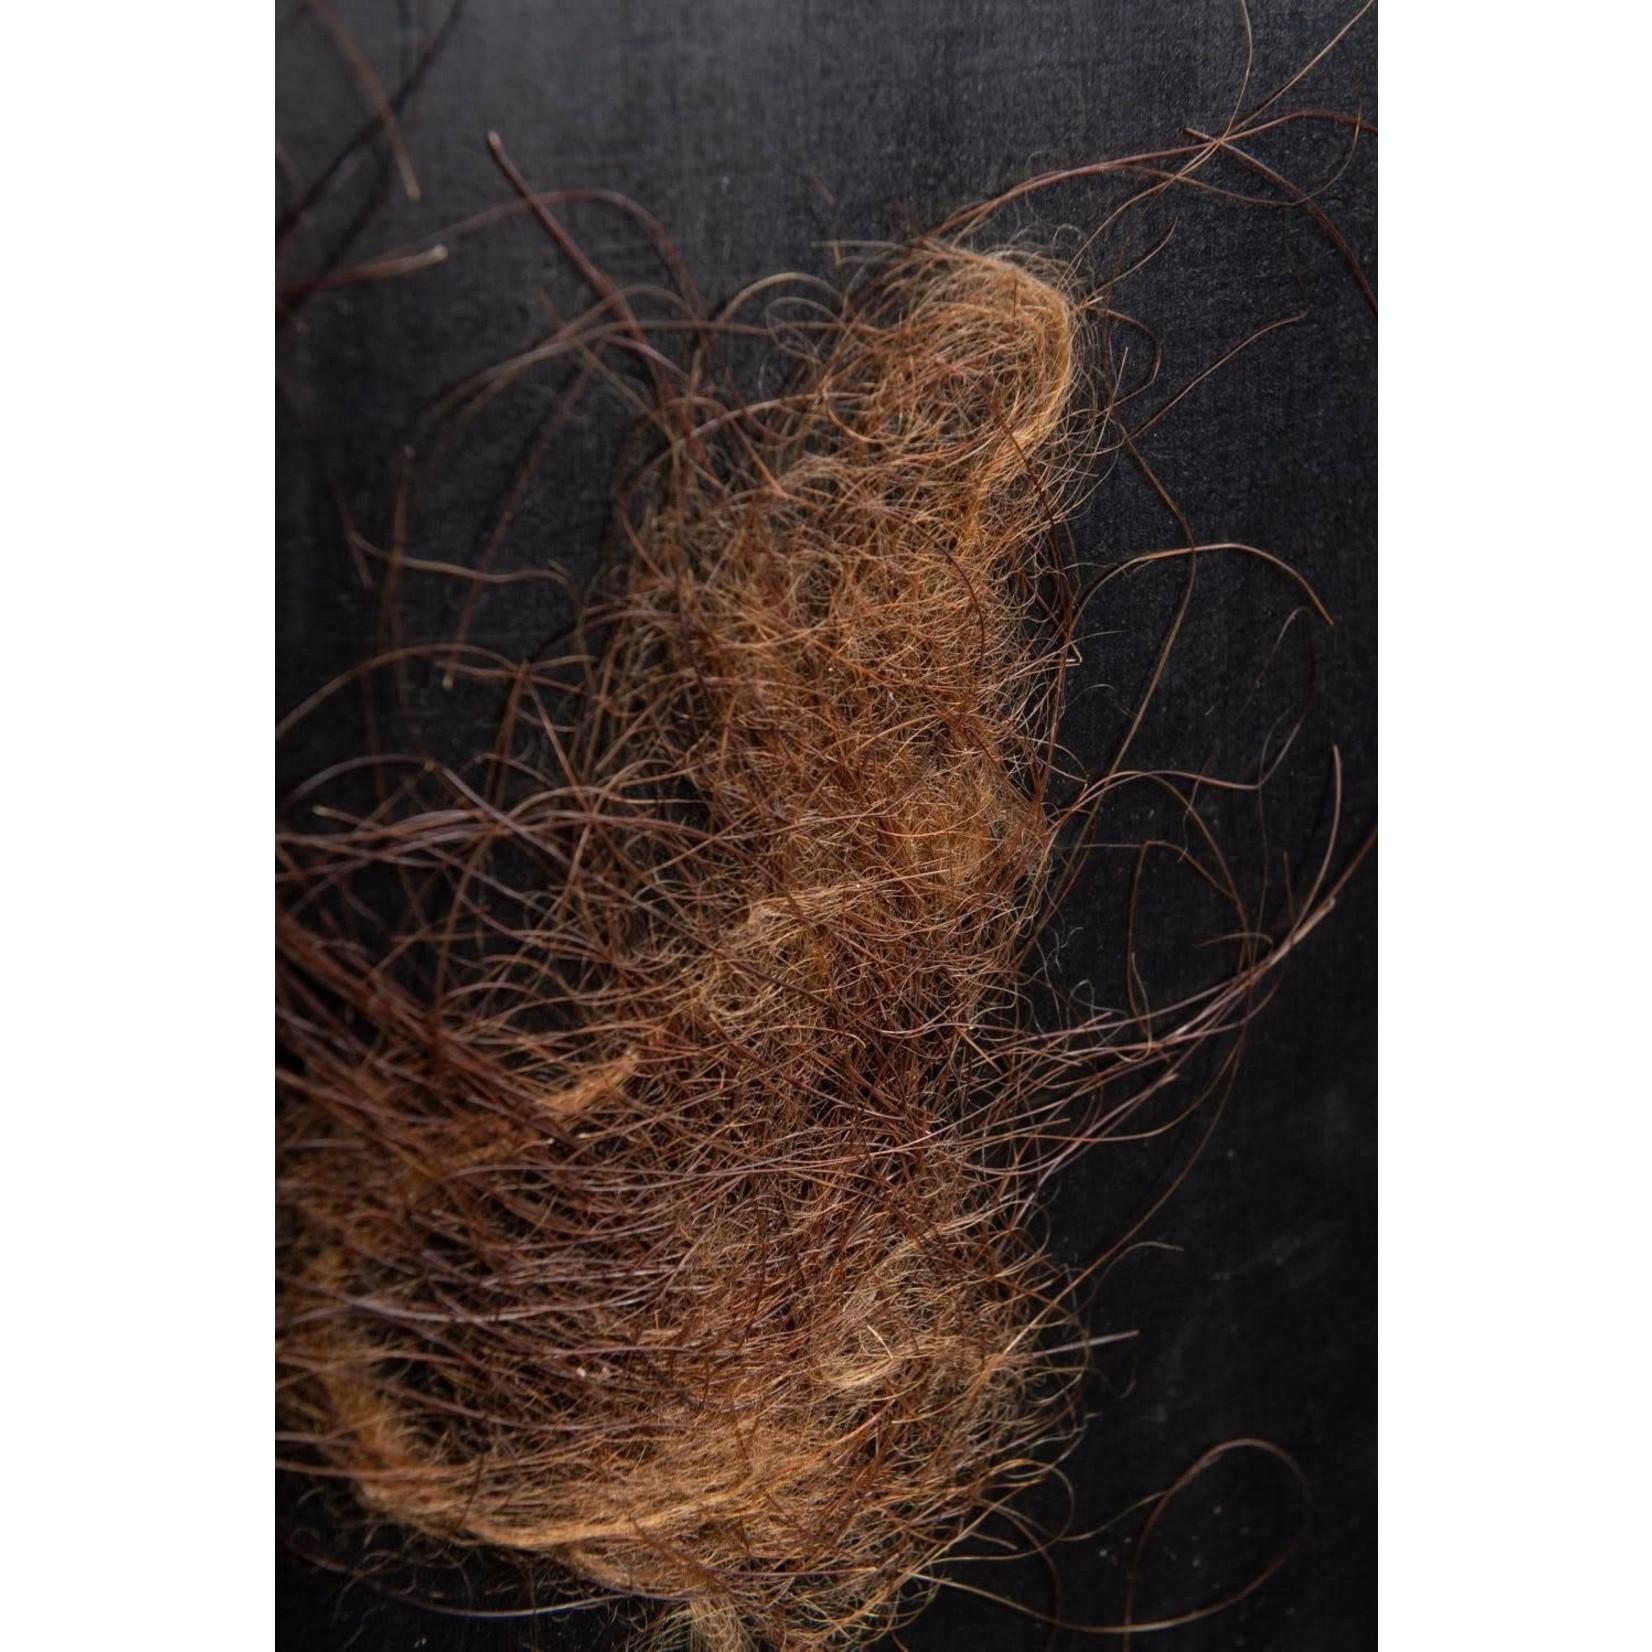 OBJET DE CURIOSITE MAMMOTH HAIR IN BLACK FRAME